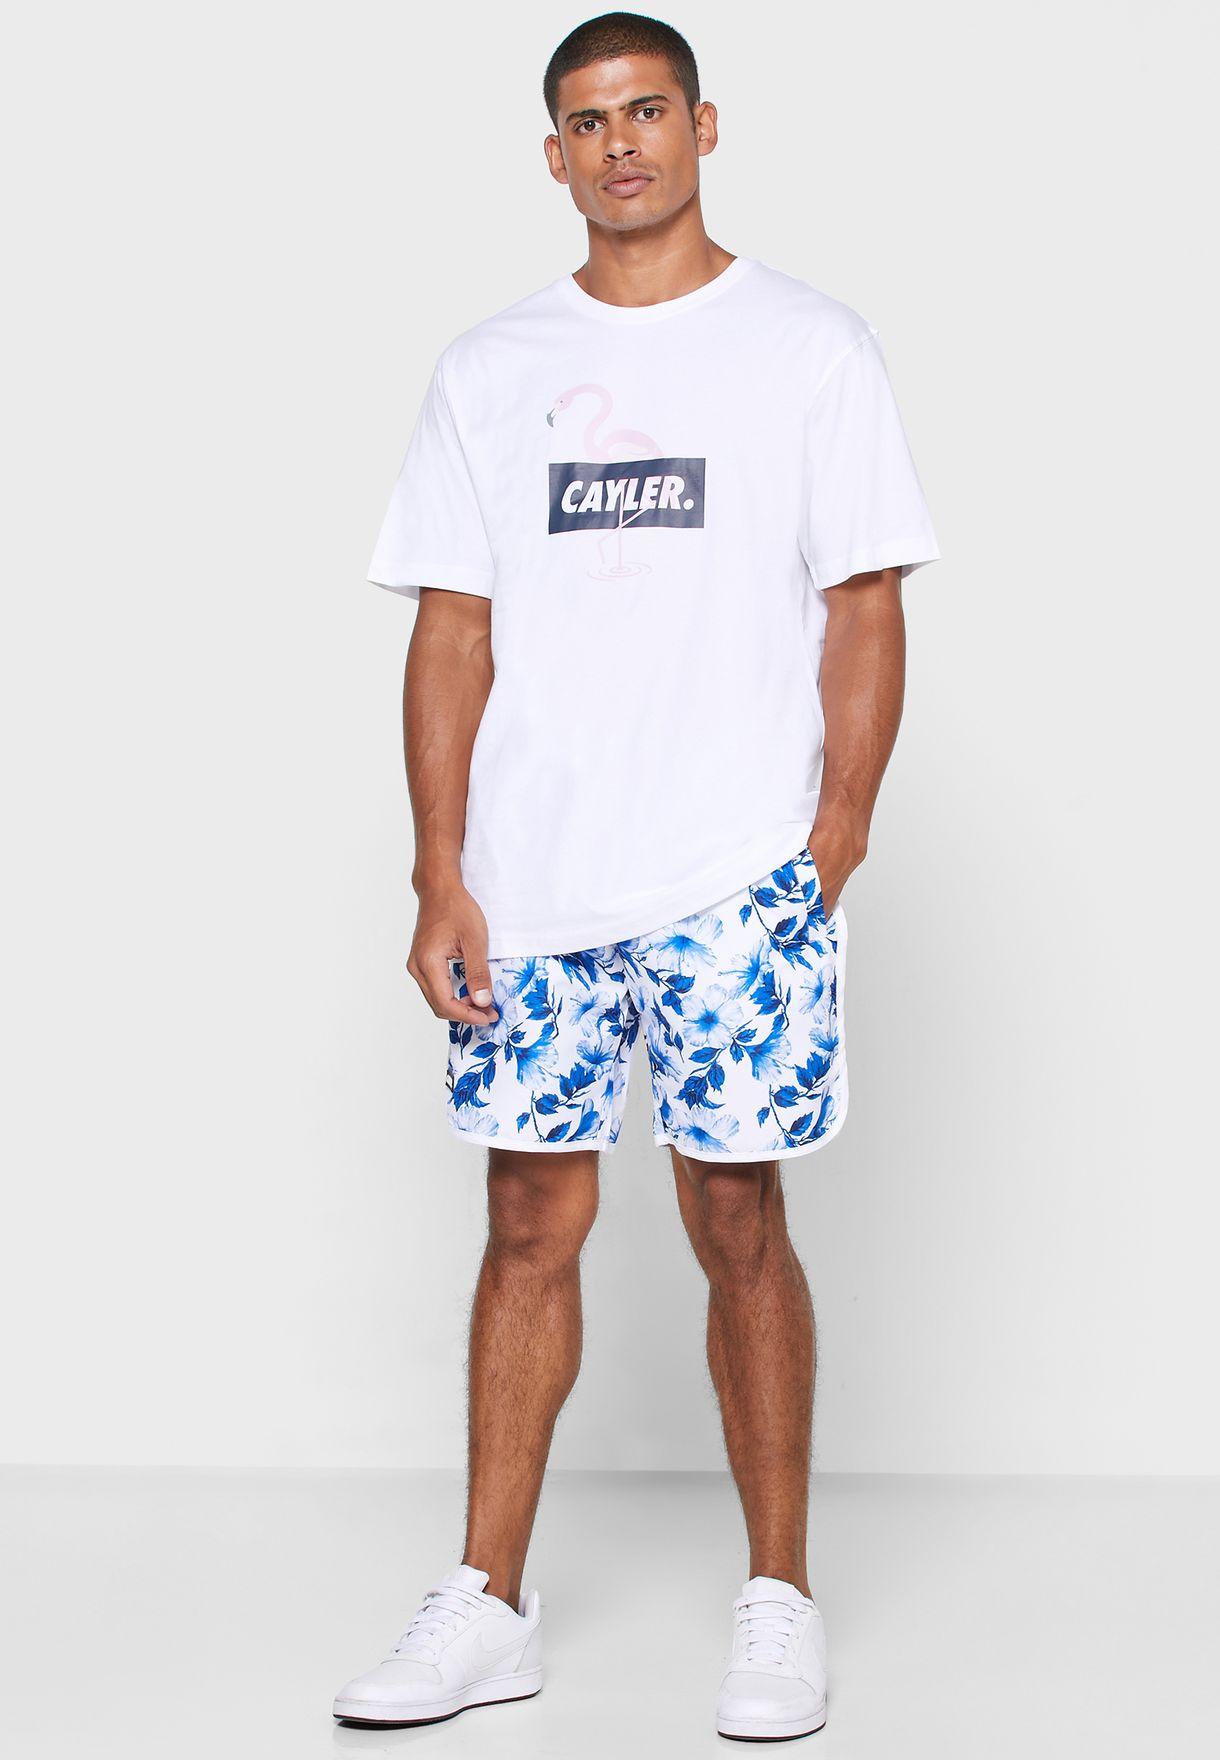 Trop Cher Micro Fiber Shorts